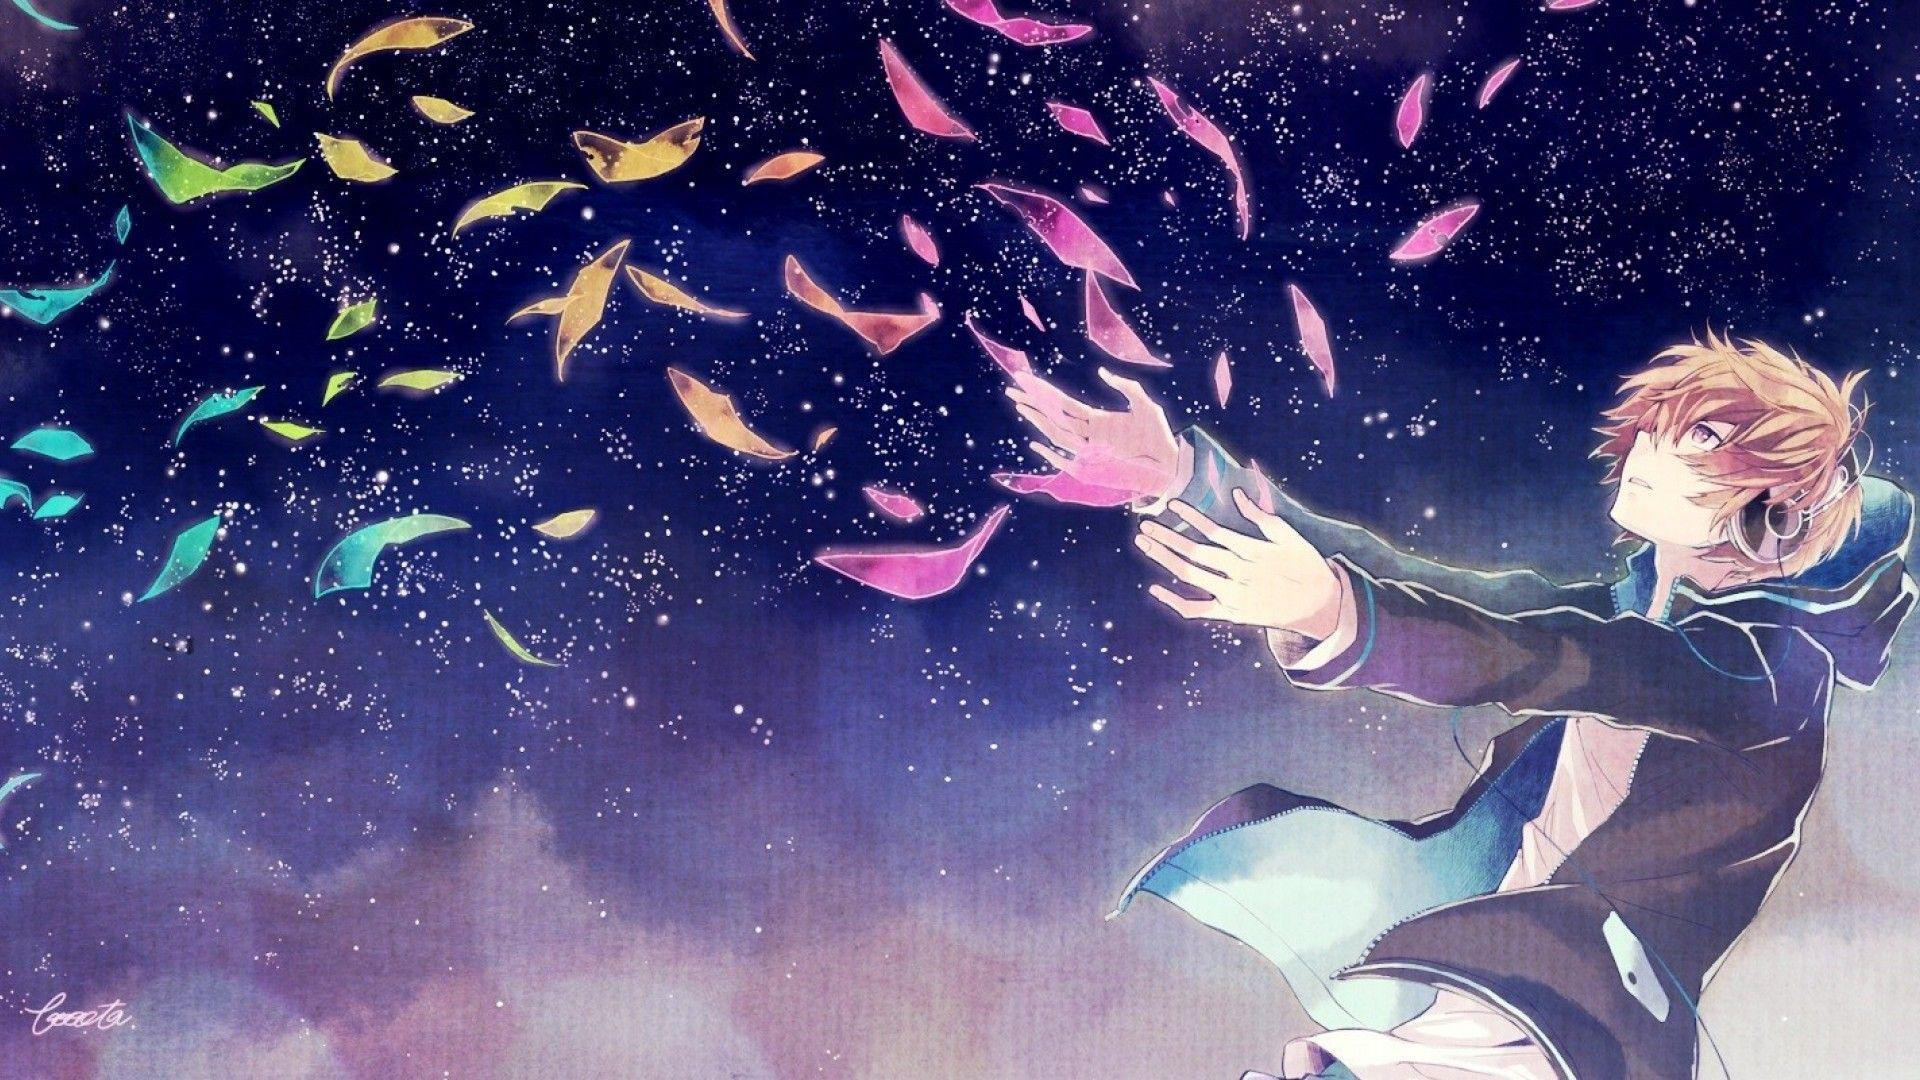 Anime headphones wallpaper Anime background, Anime music